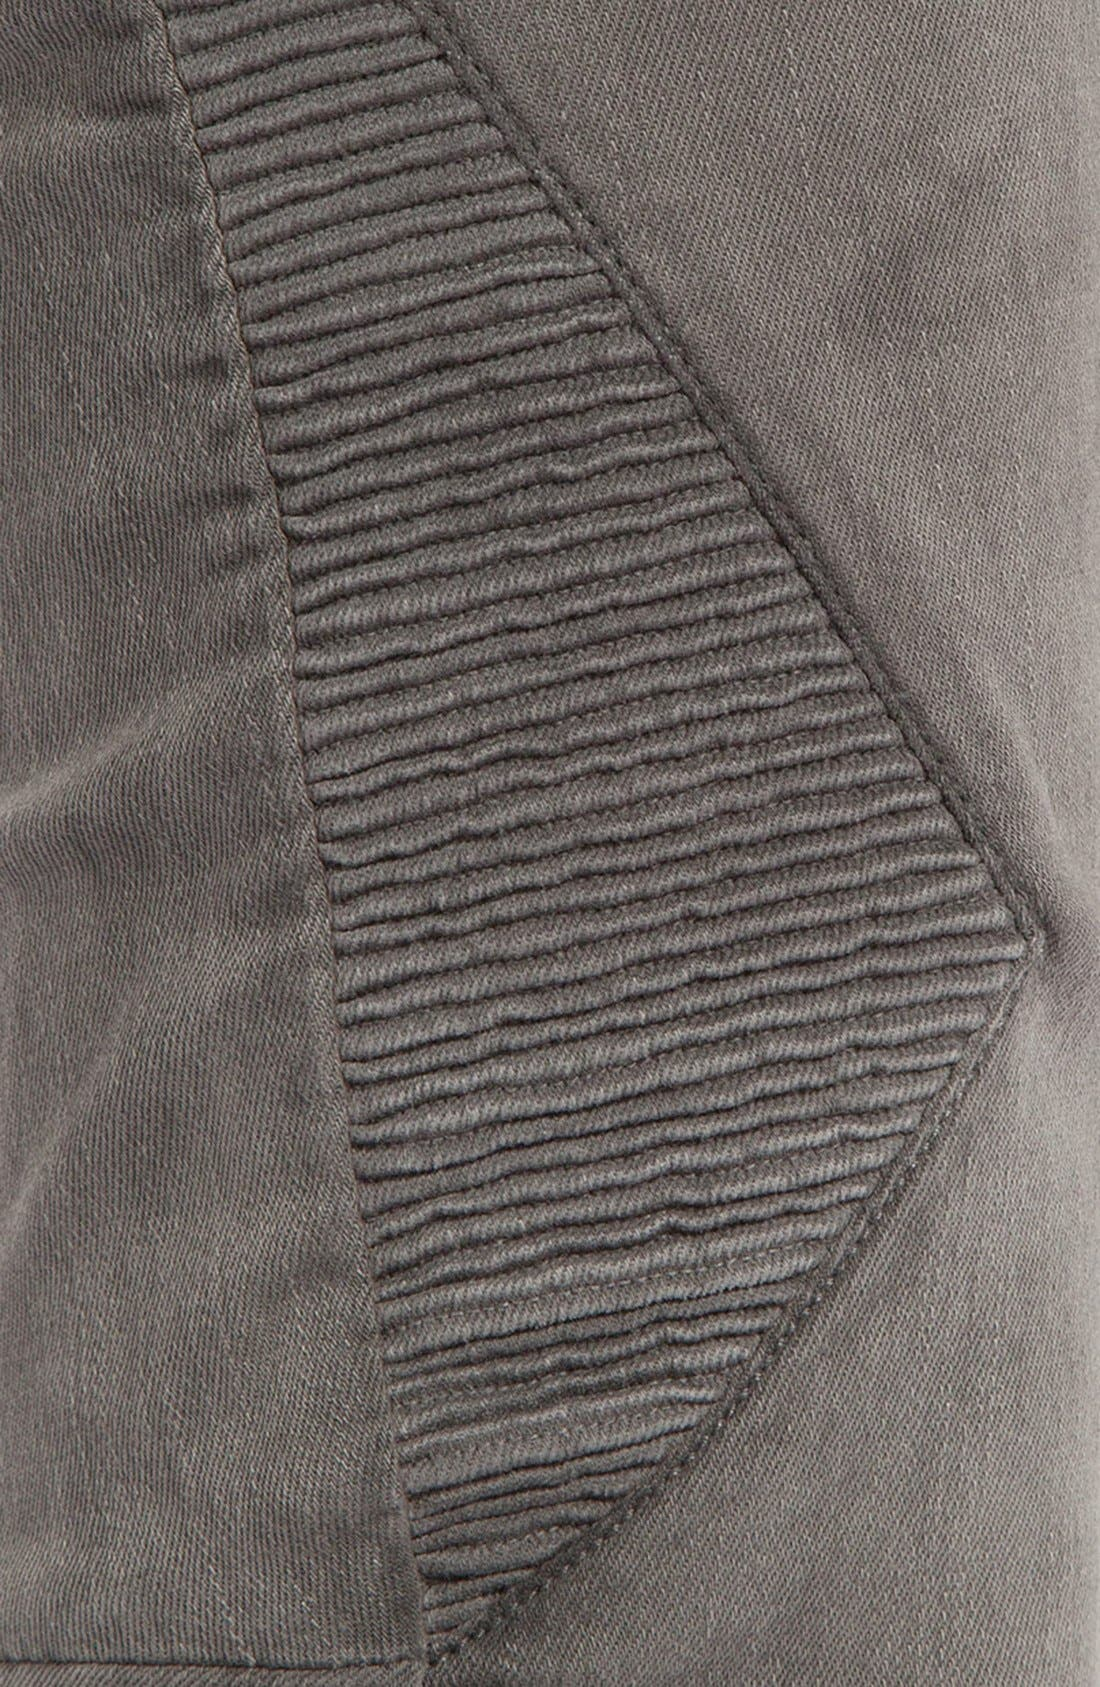 Alternate Image 3  - maje 'Diabolo' Skinny Jeans (Charcoal Grey)